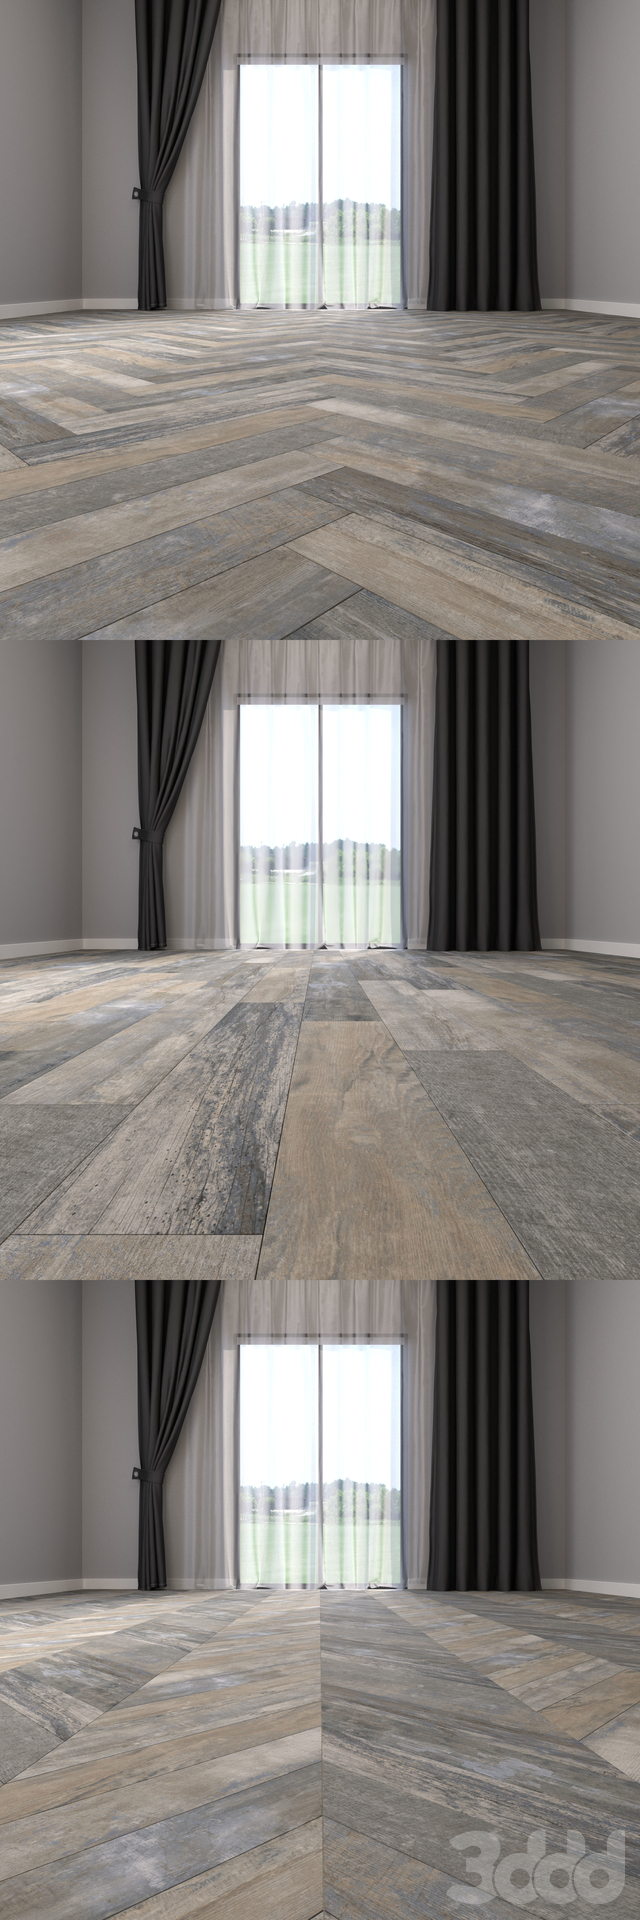 Parquet Floor Set 18